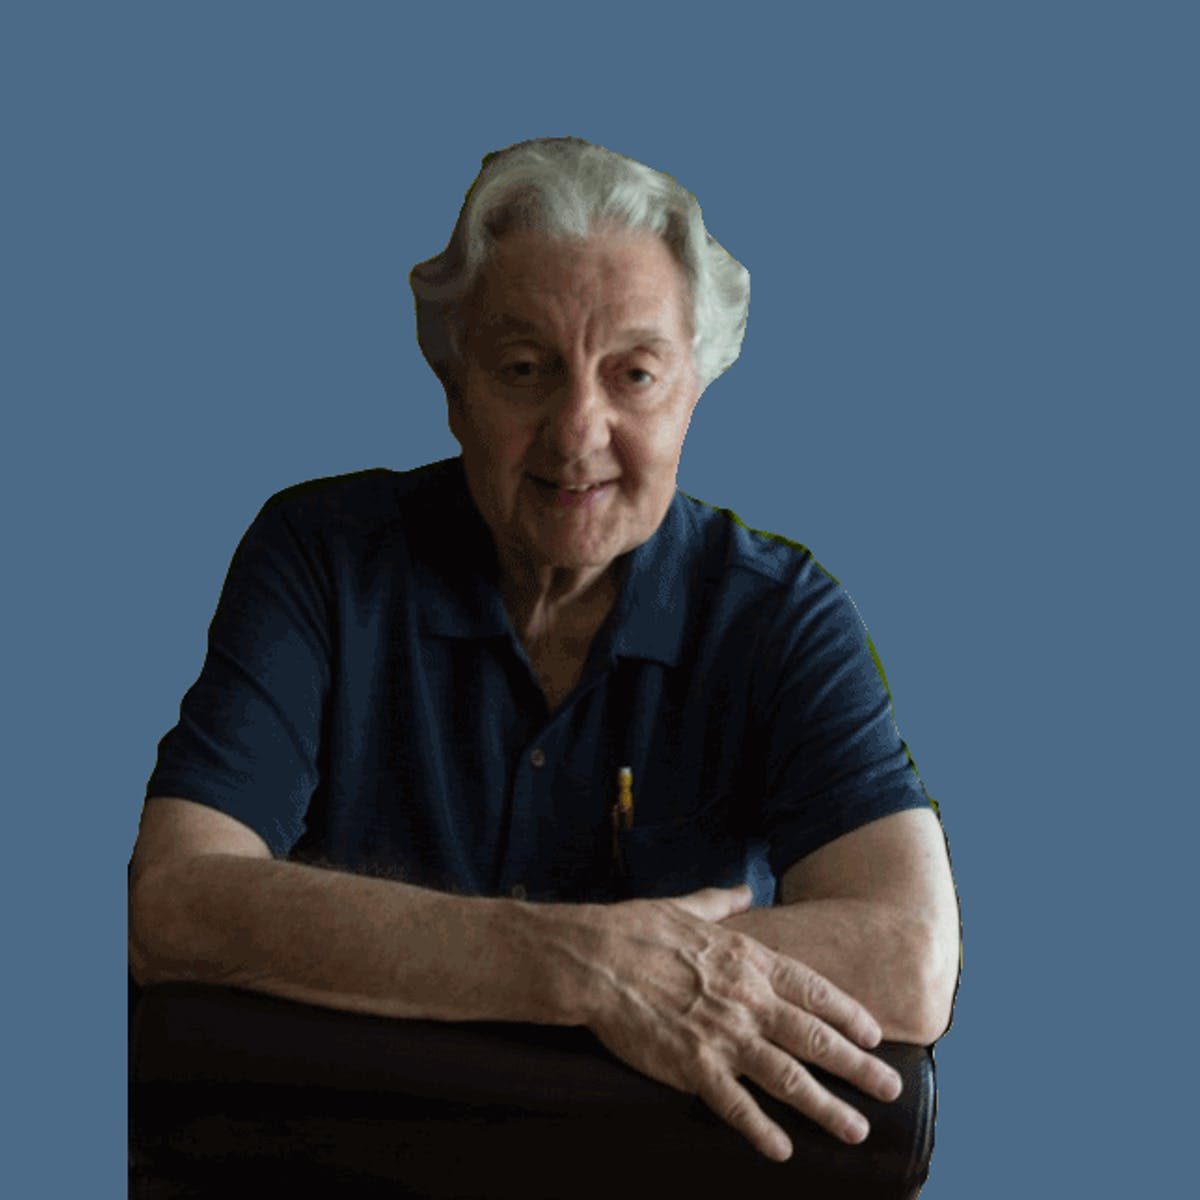 Dr. Herbert Kleber: Methadone pioneer's approach still helps people today